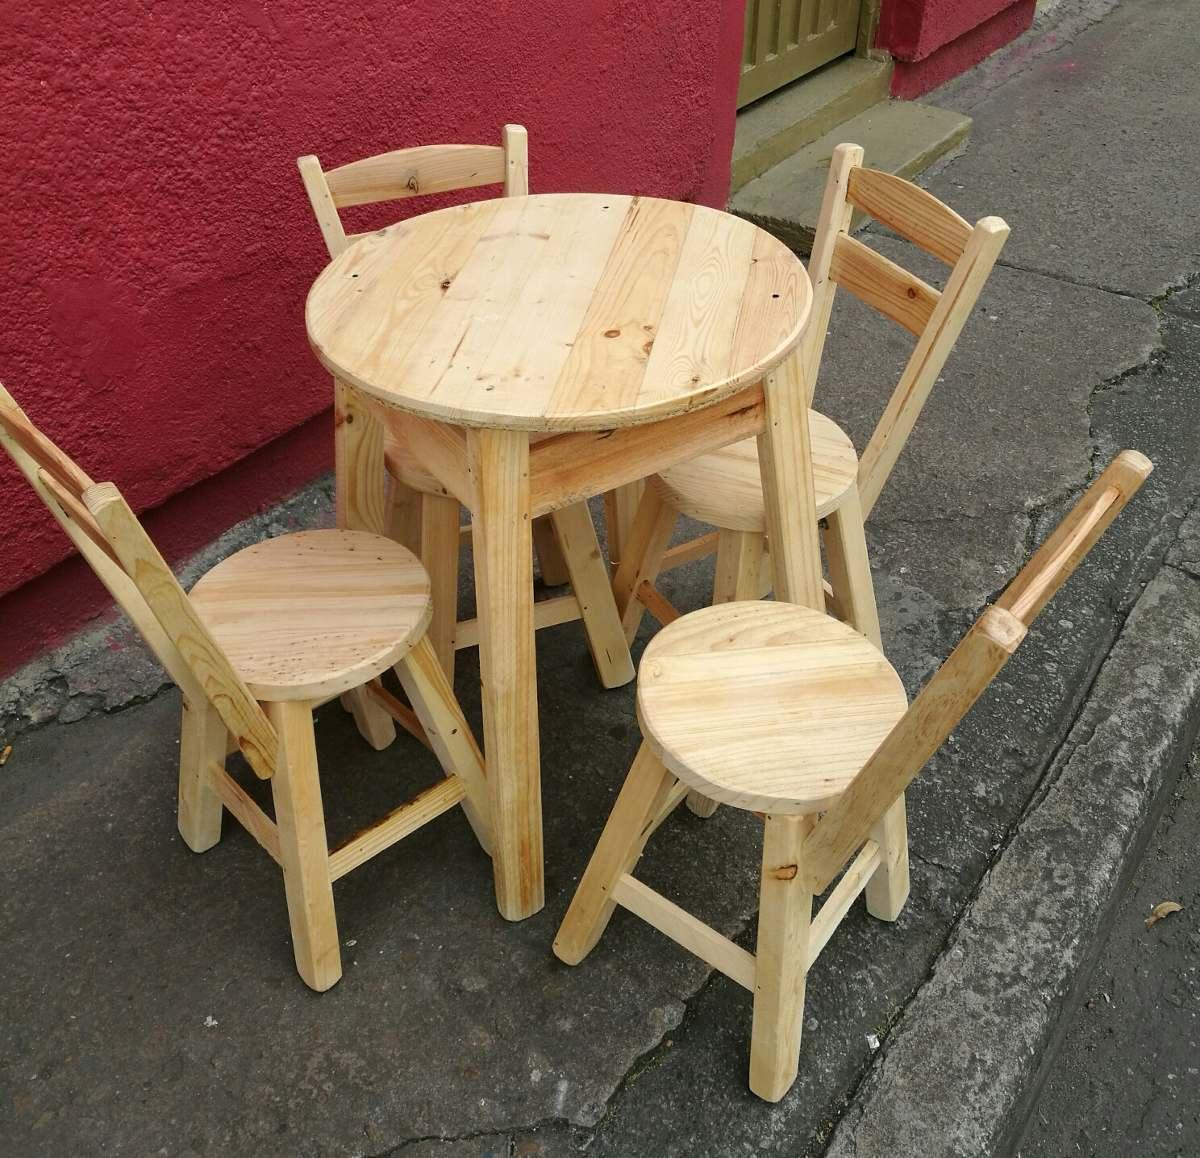 Fabrica de muebles wimpy obtenga ideas dise o de muebles for Fabrica de bares de madera